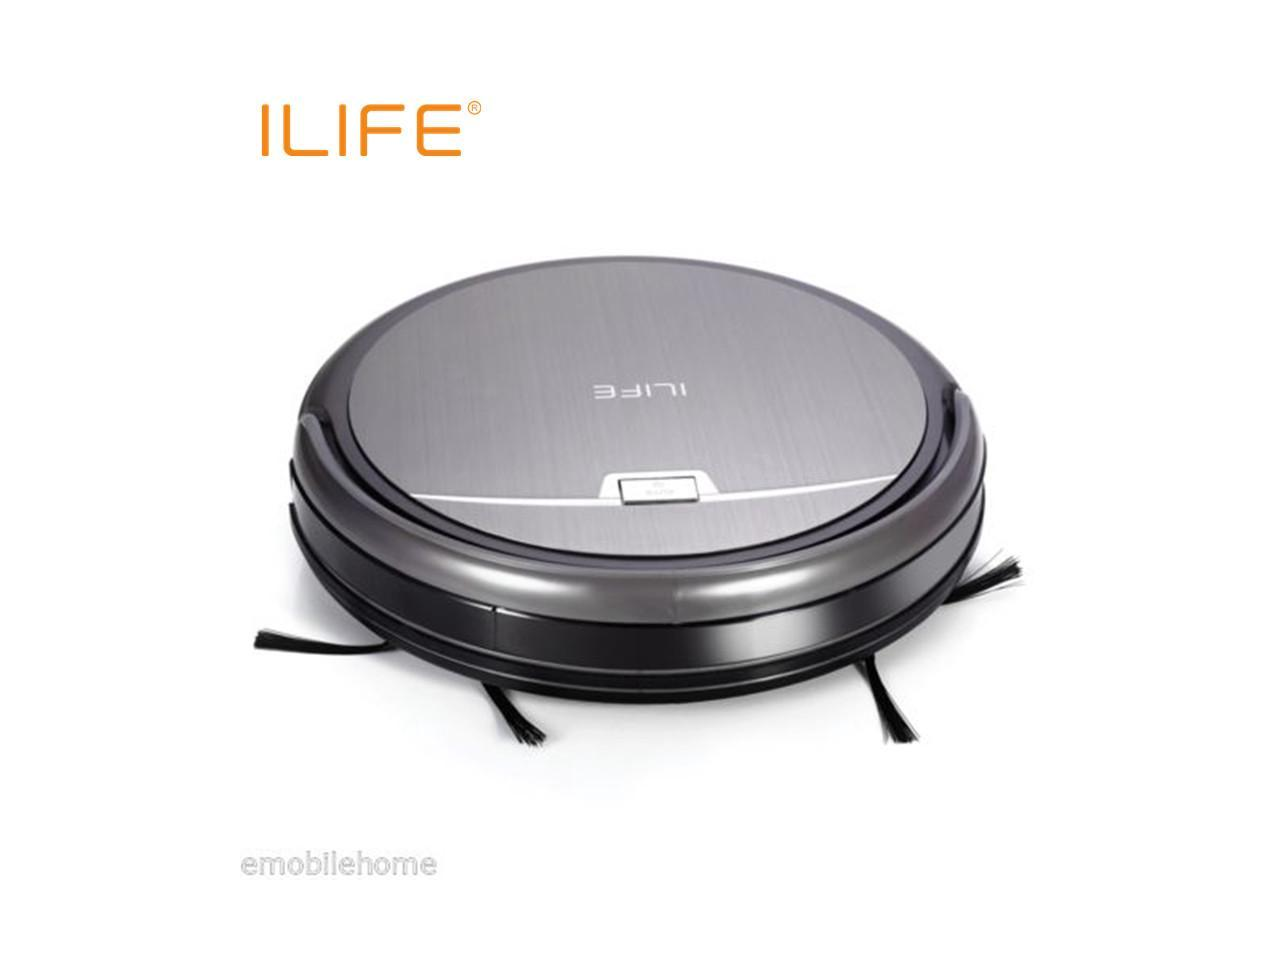 ILIFE A4S Smart Robotic Vacuum Cleaner Sweeping Machine Self-recharging HEPA US